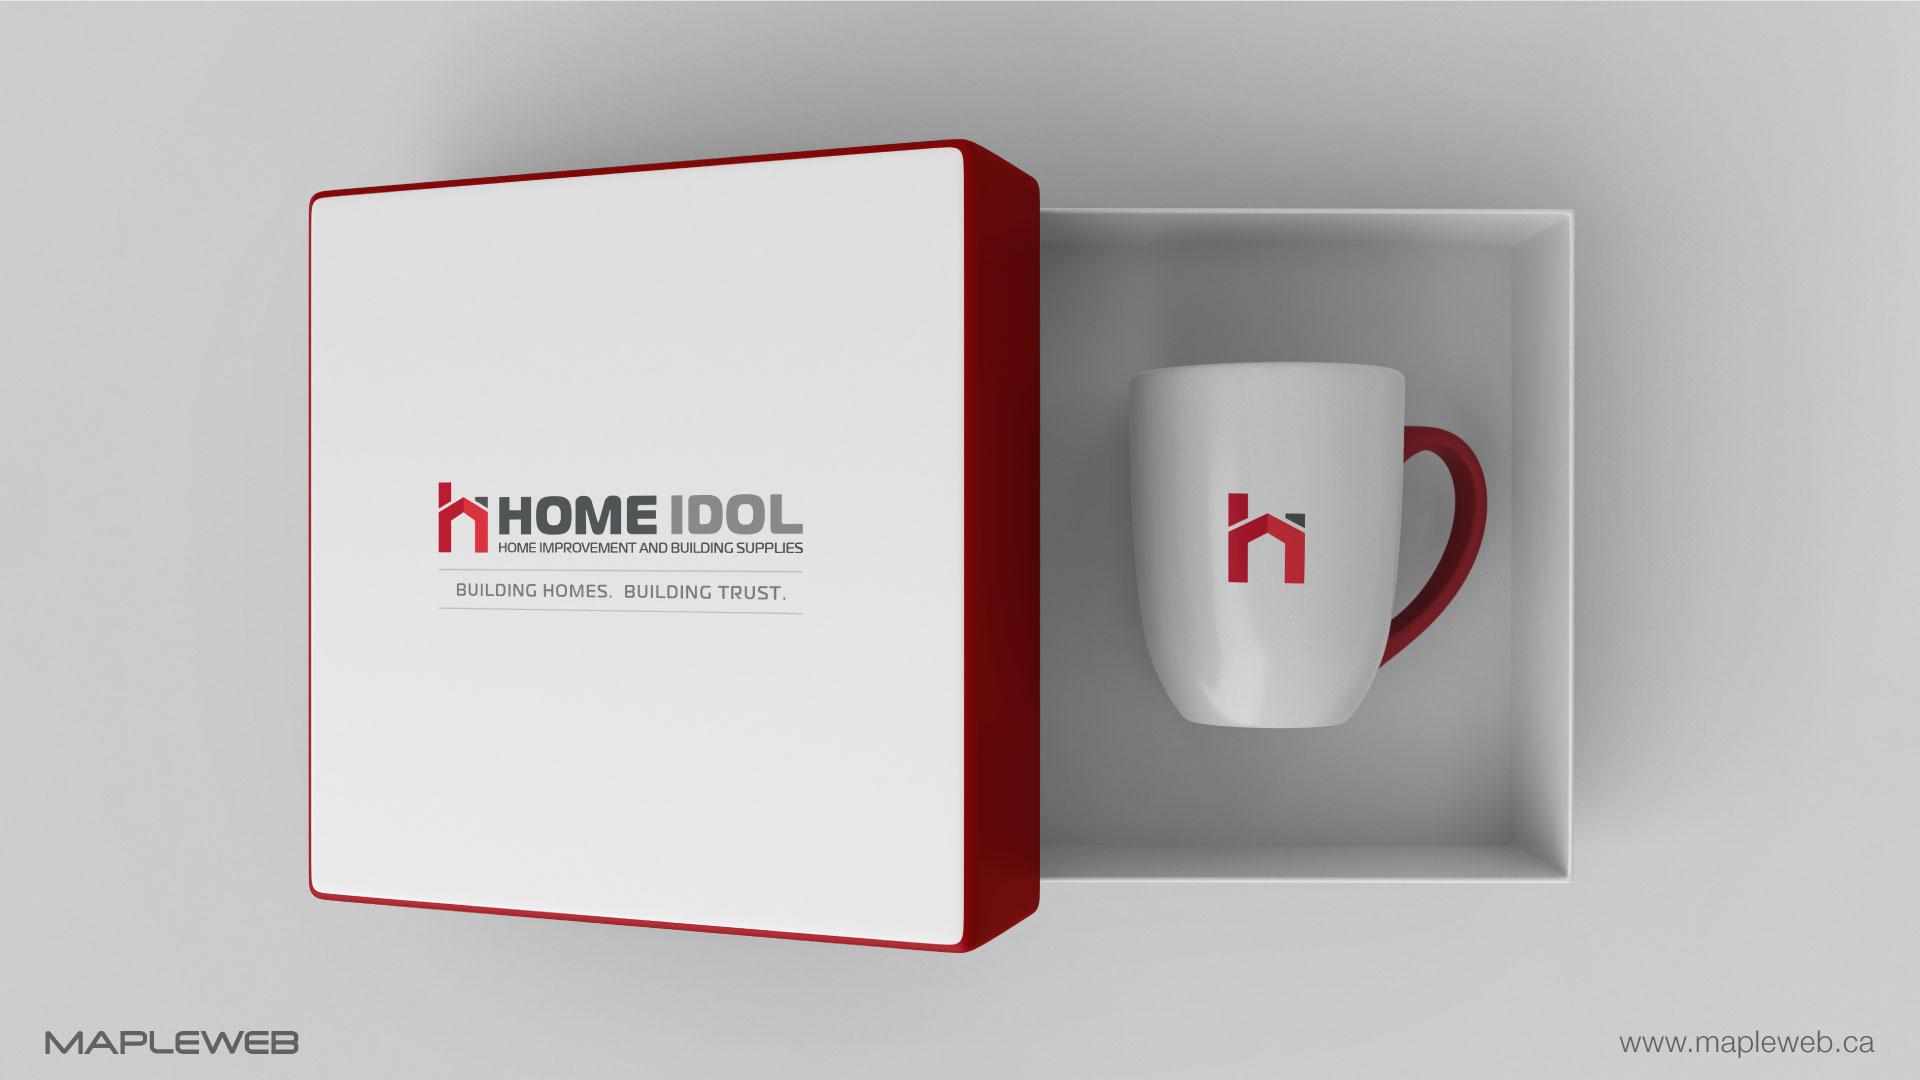 home-idol-brand-logo-design-by-mapleweb-vancouver-canada-white-mug-mock